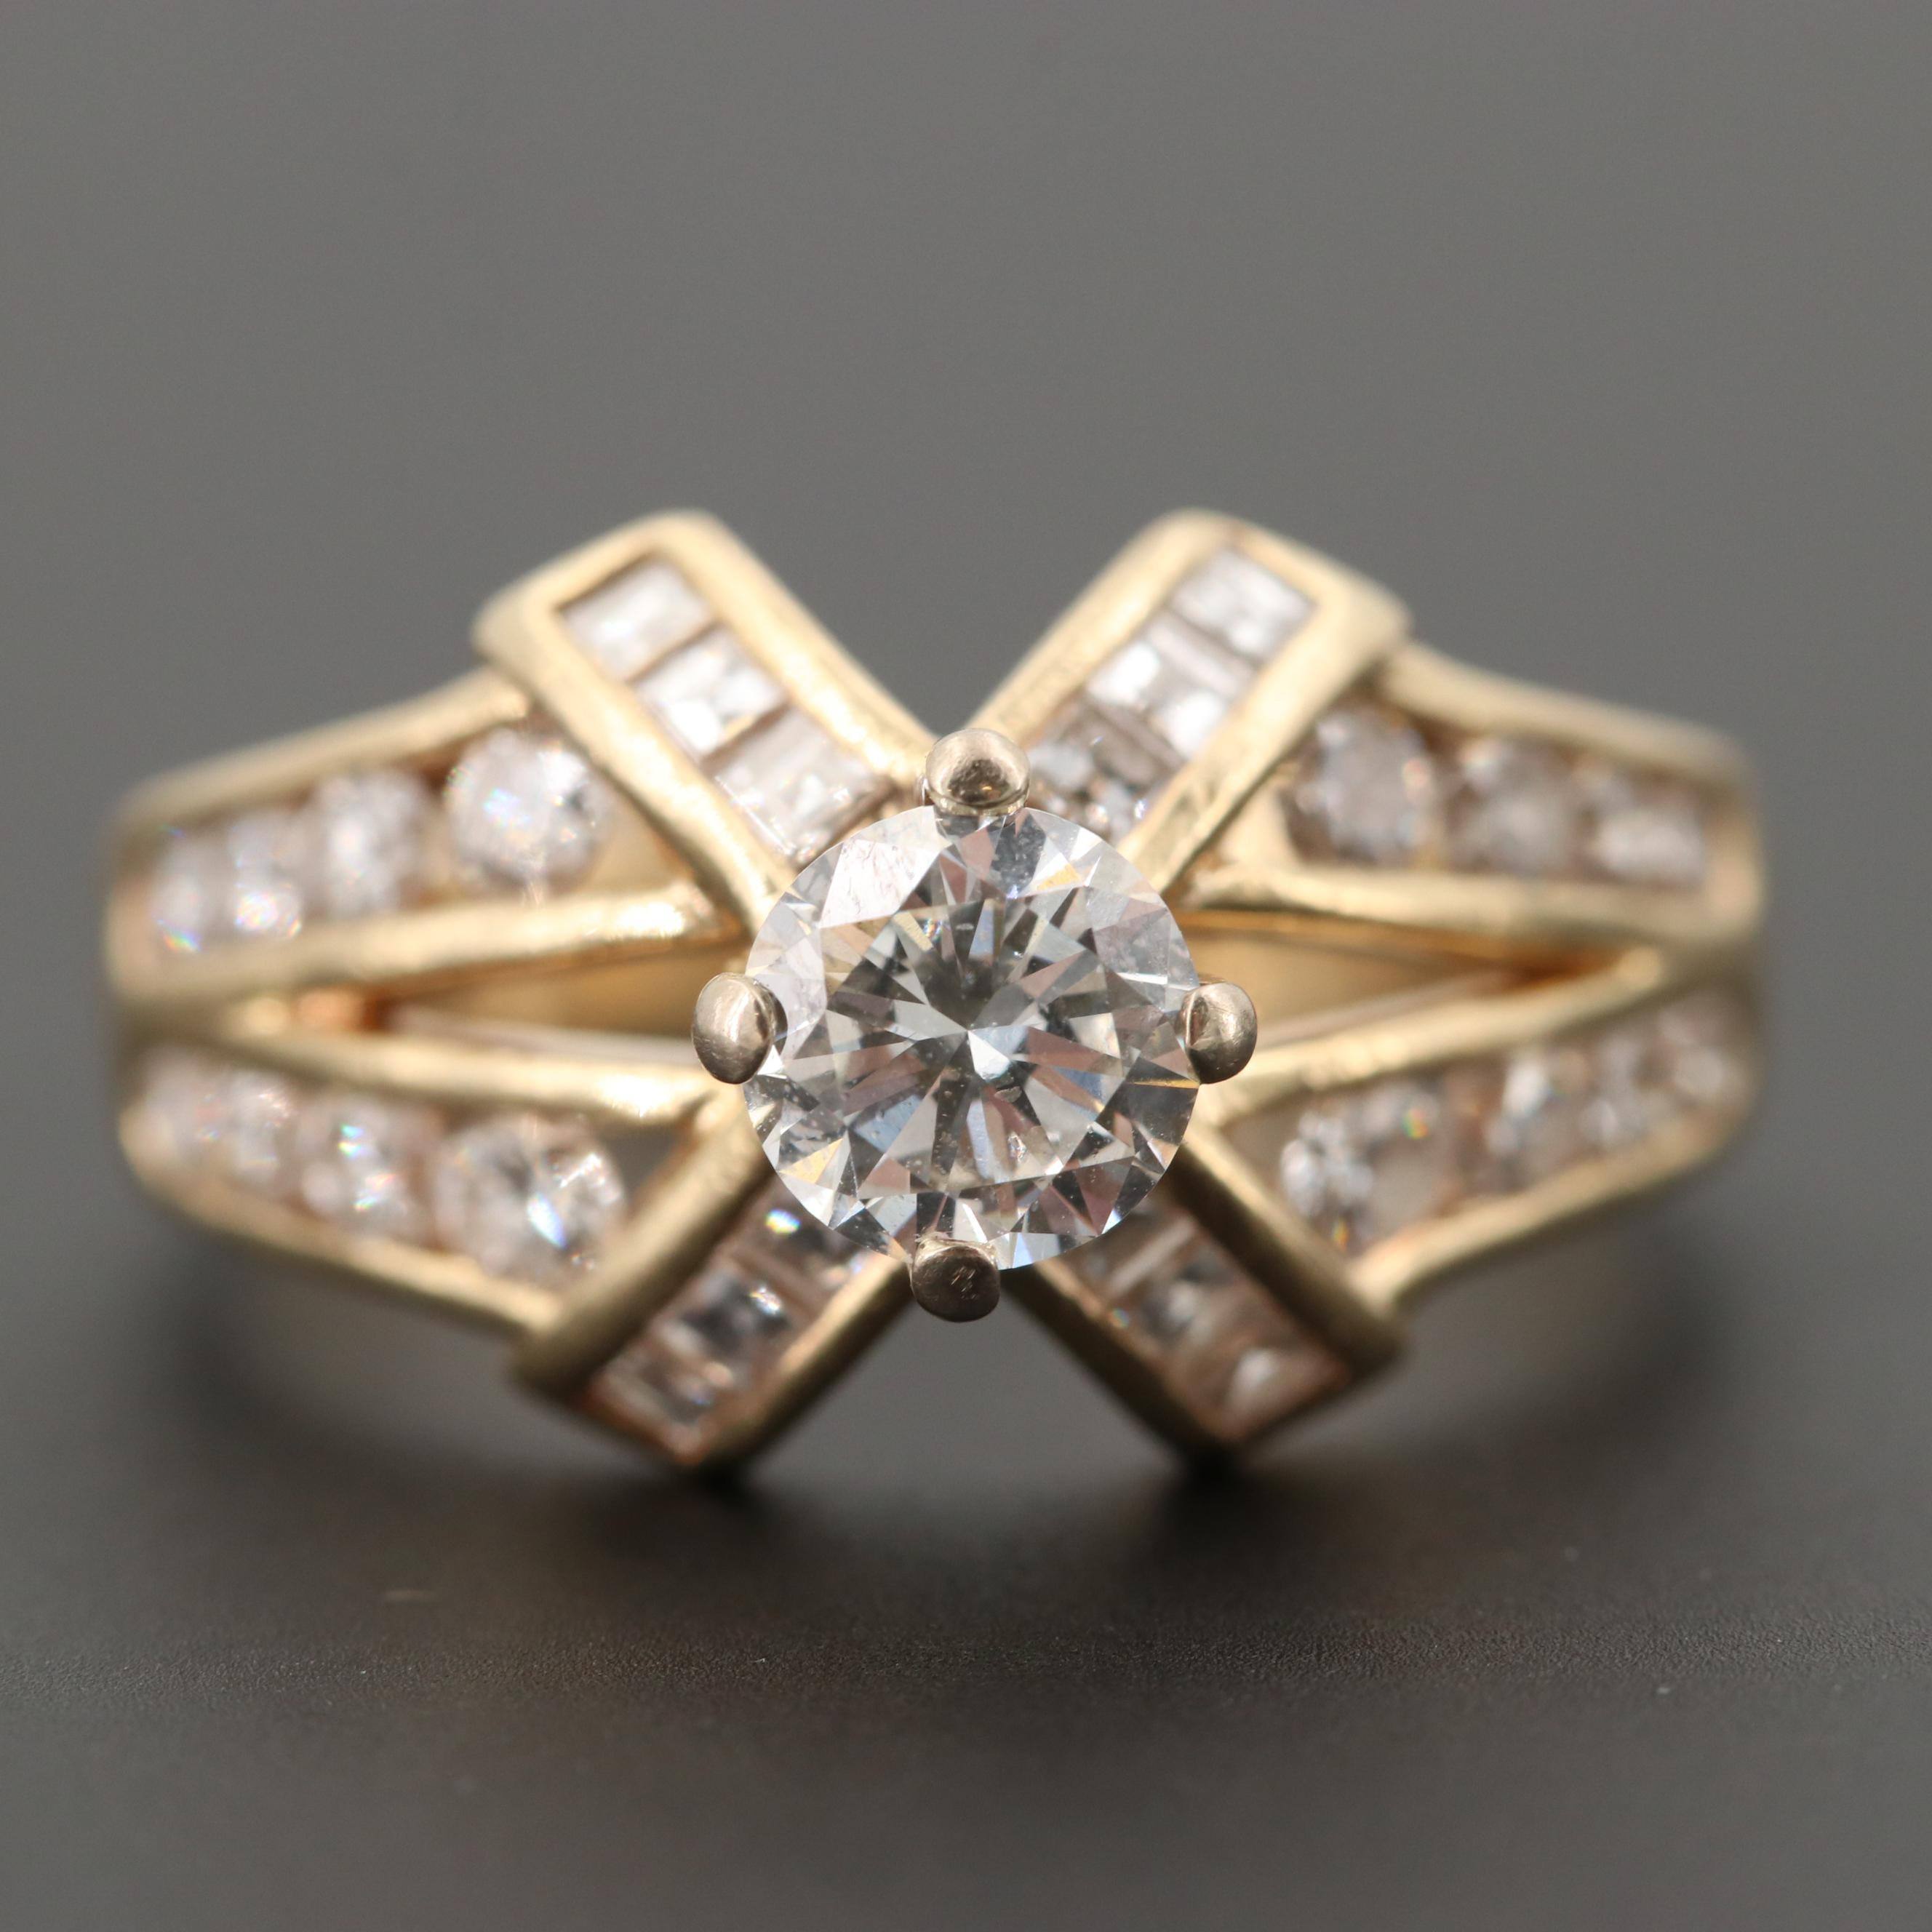 14K Yellow Gold 1.53 CTW Diamond Ring